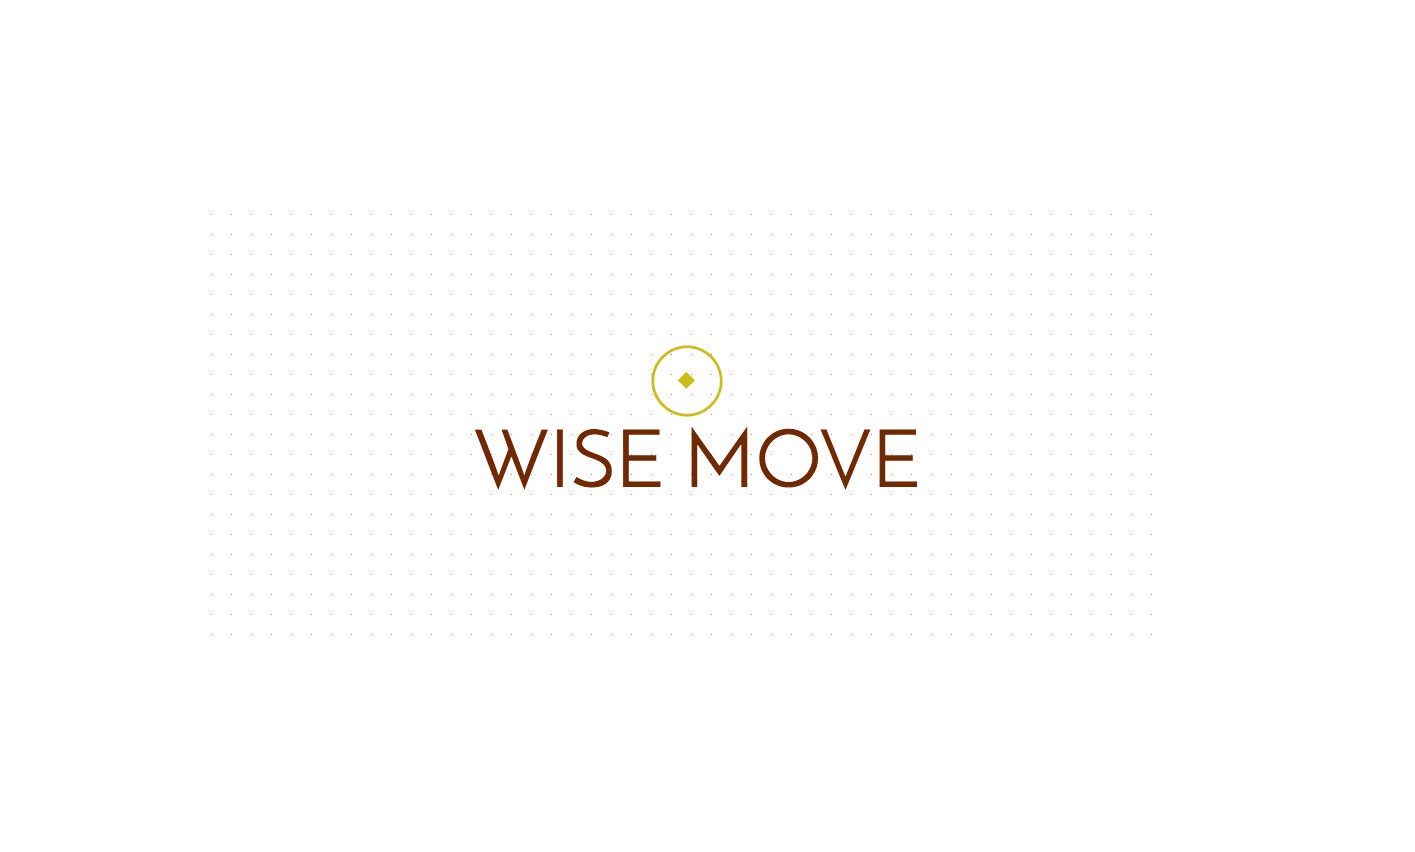 Wise_Move_Logos_21.jpg